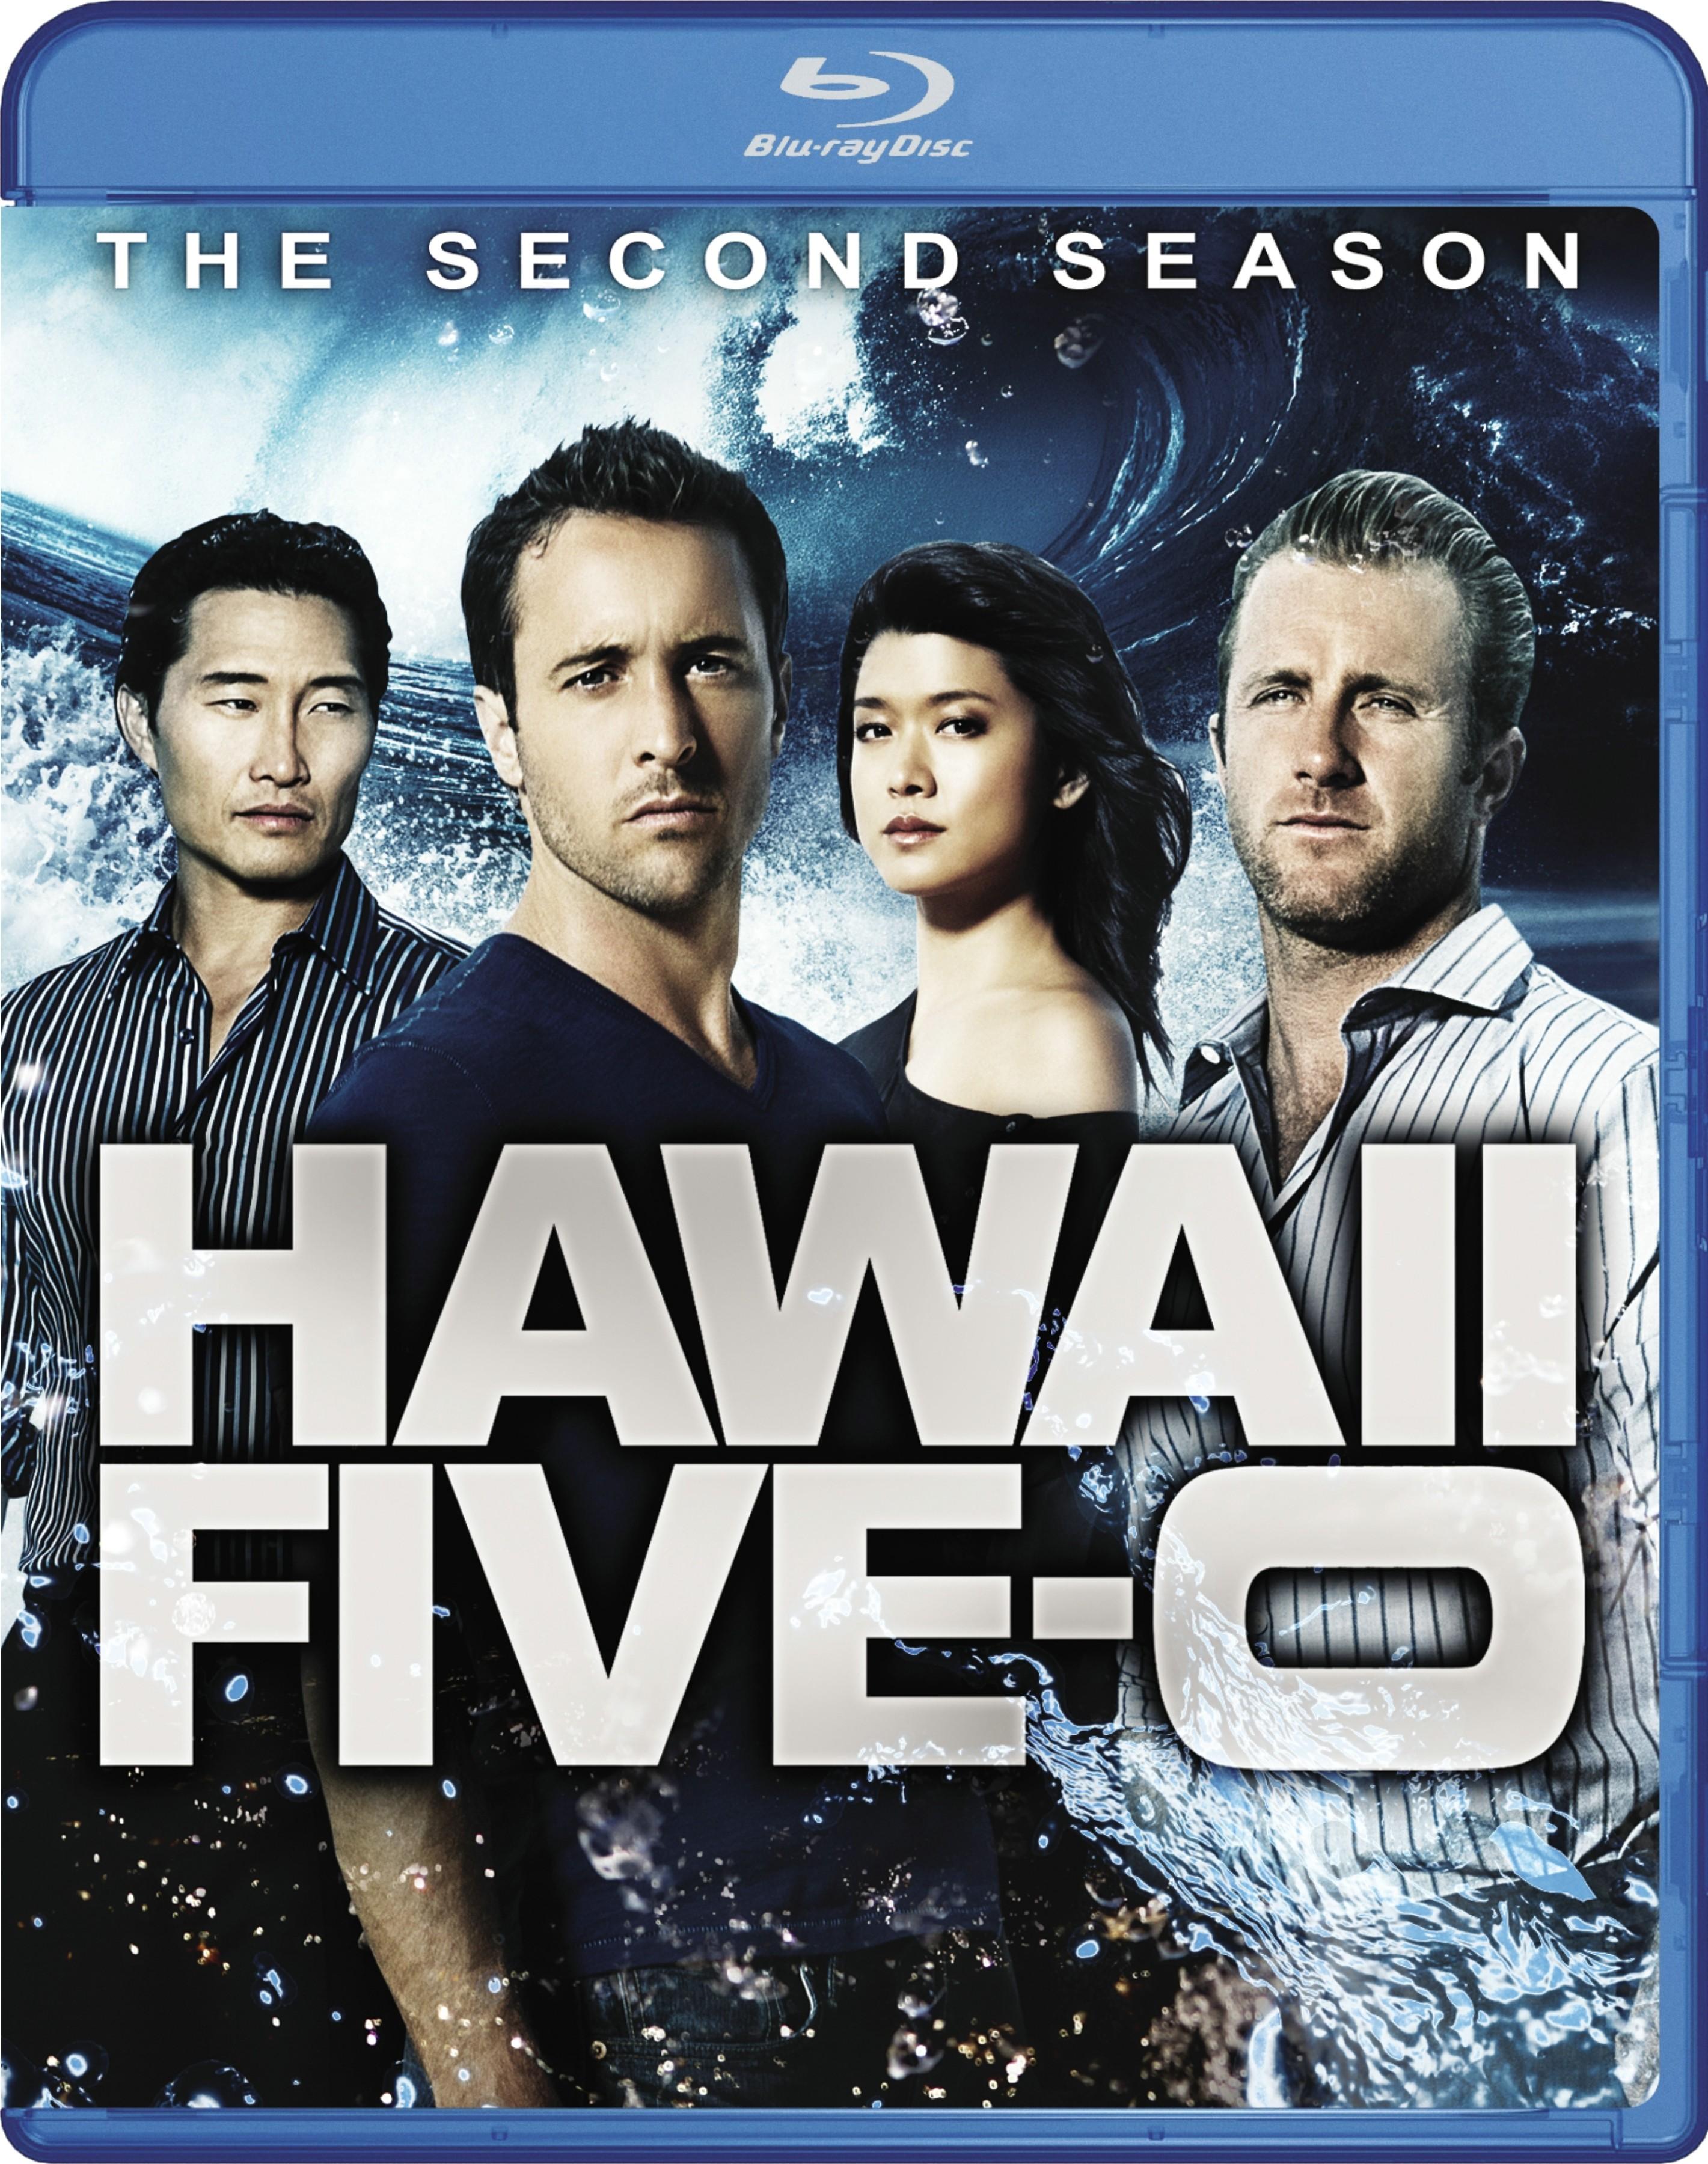 Hawaii Five-0: The Second Season [5 Discs] [blu-ray] 6412858